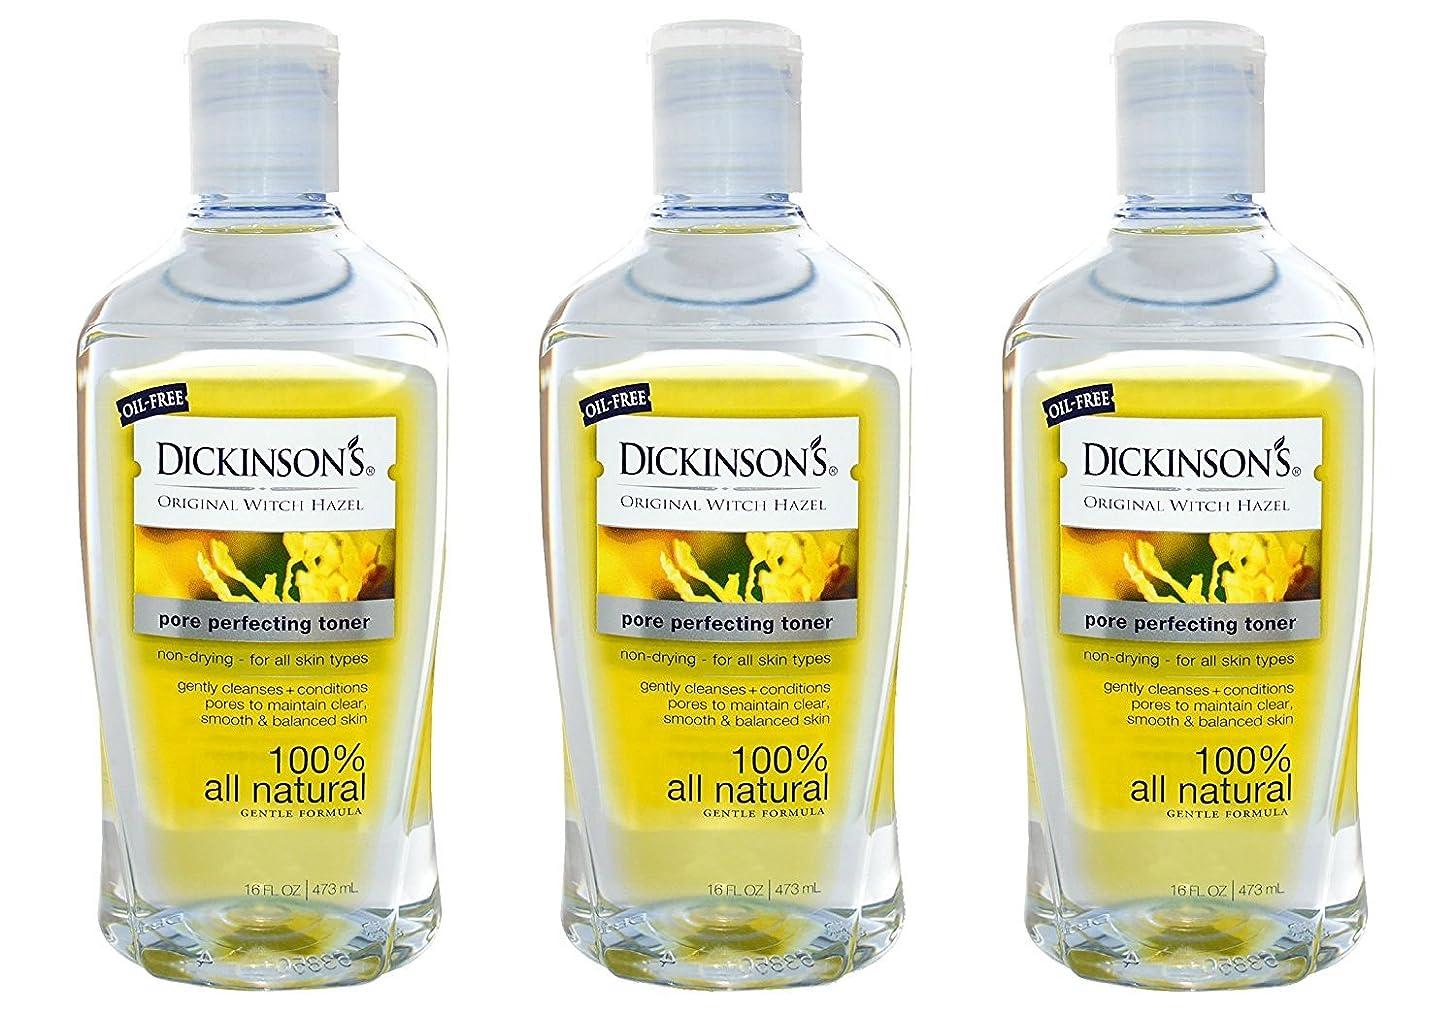 Dickinsons Original Witch Hazel Pore Perfecting Toner 16 fl. oz. (Pack of 3)